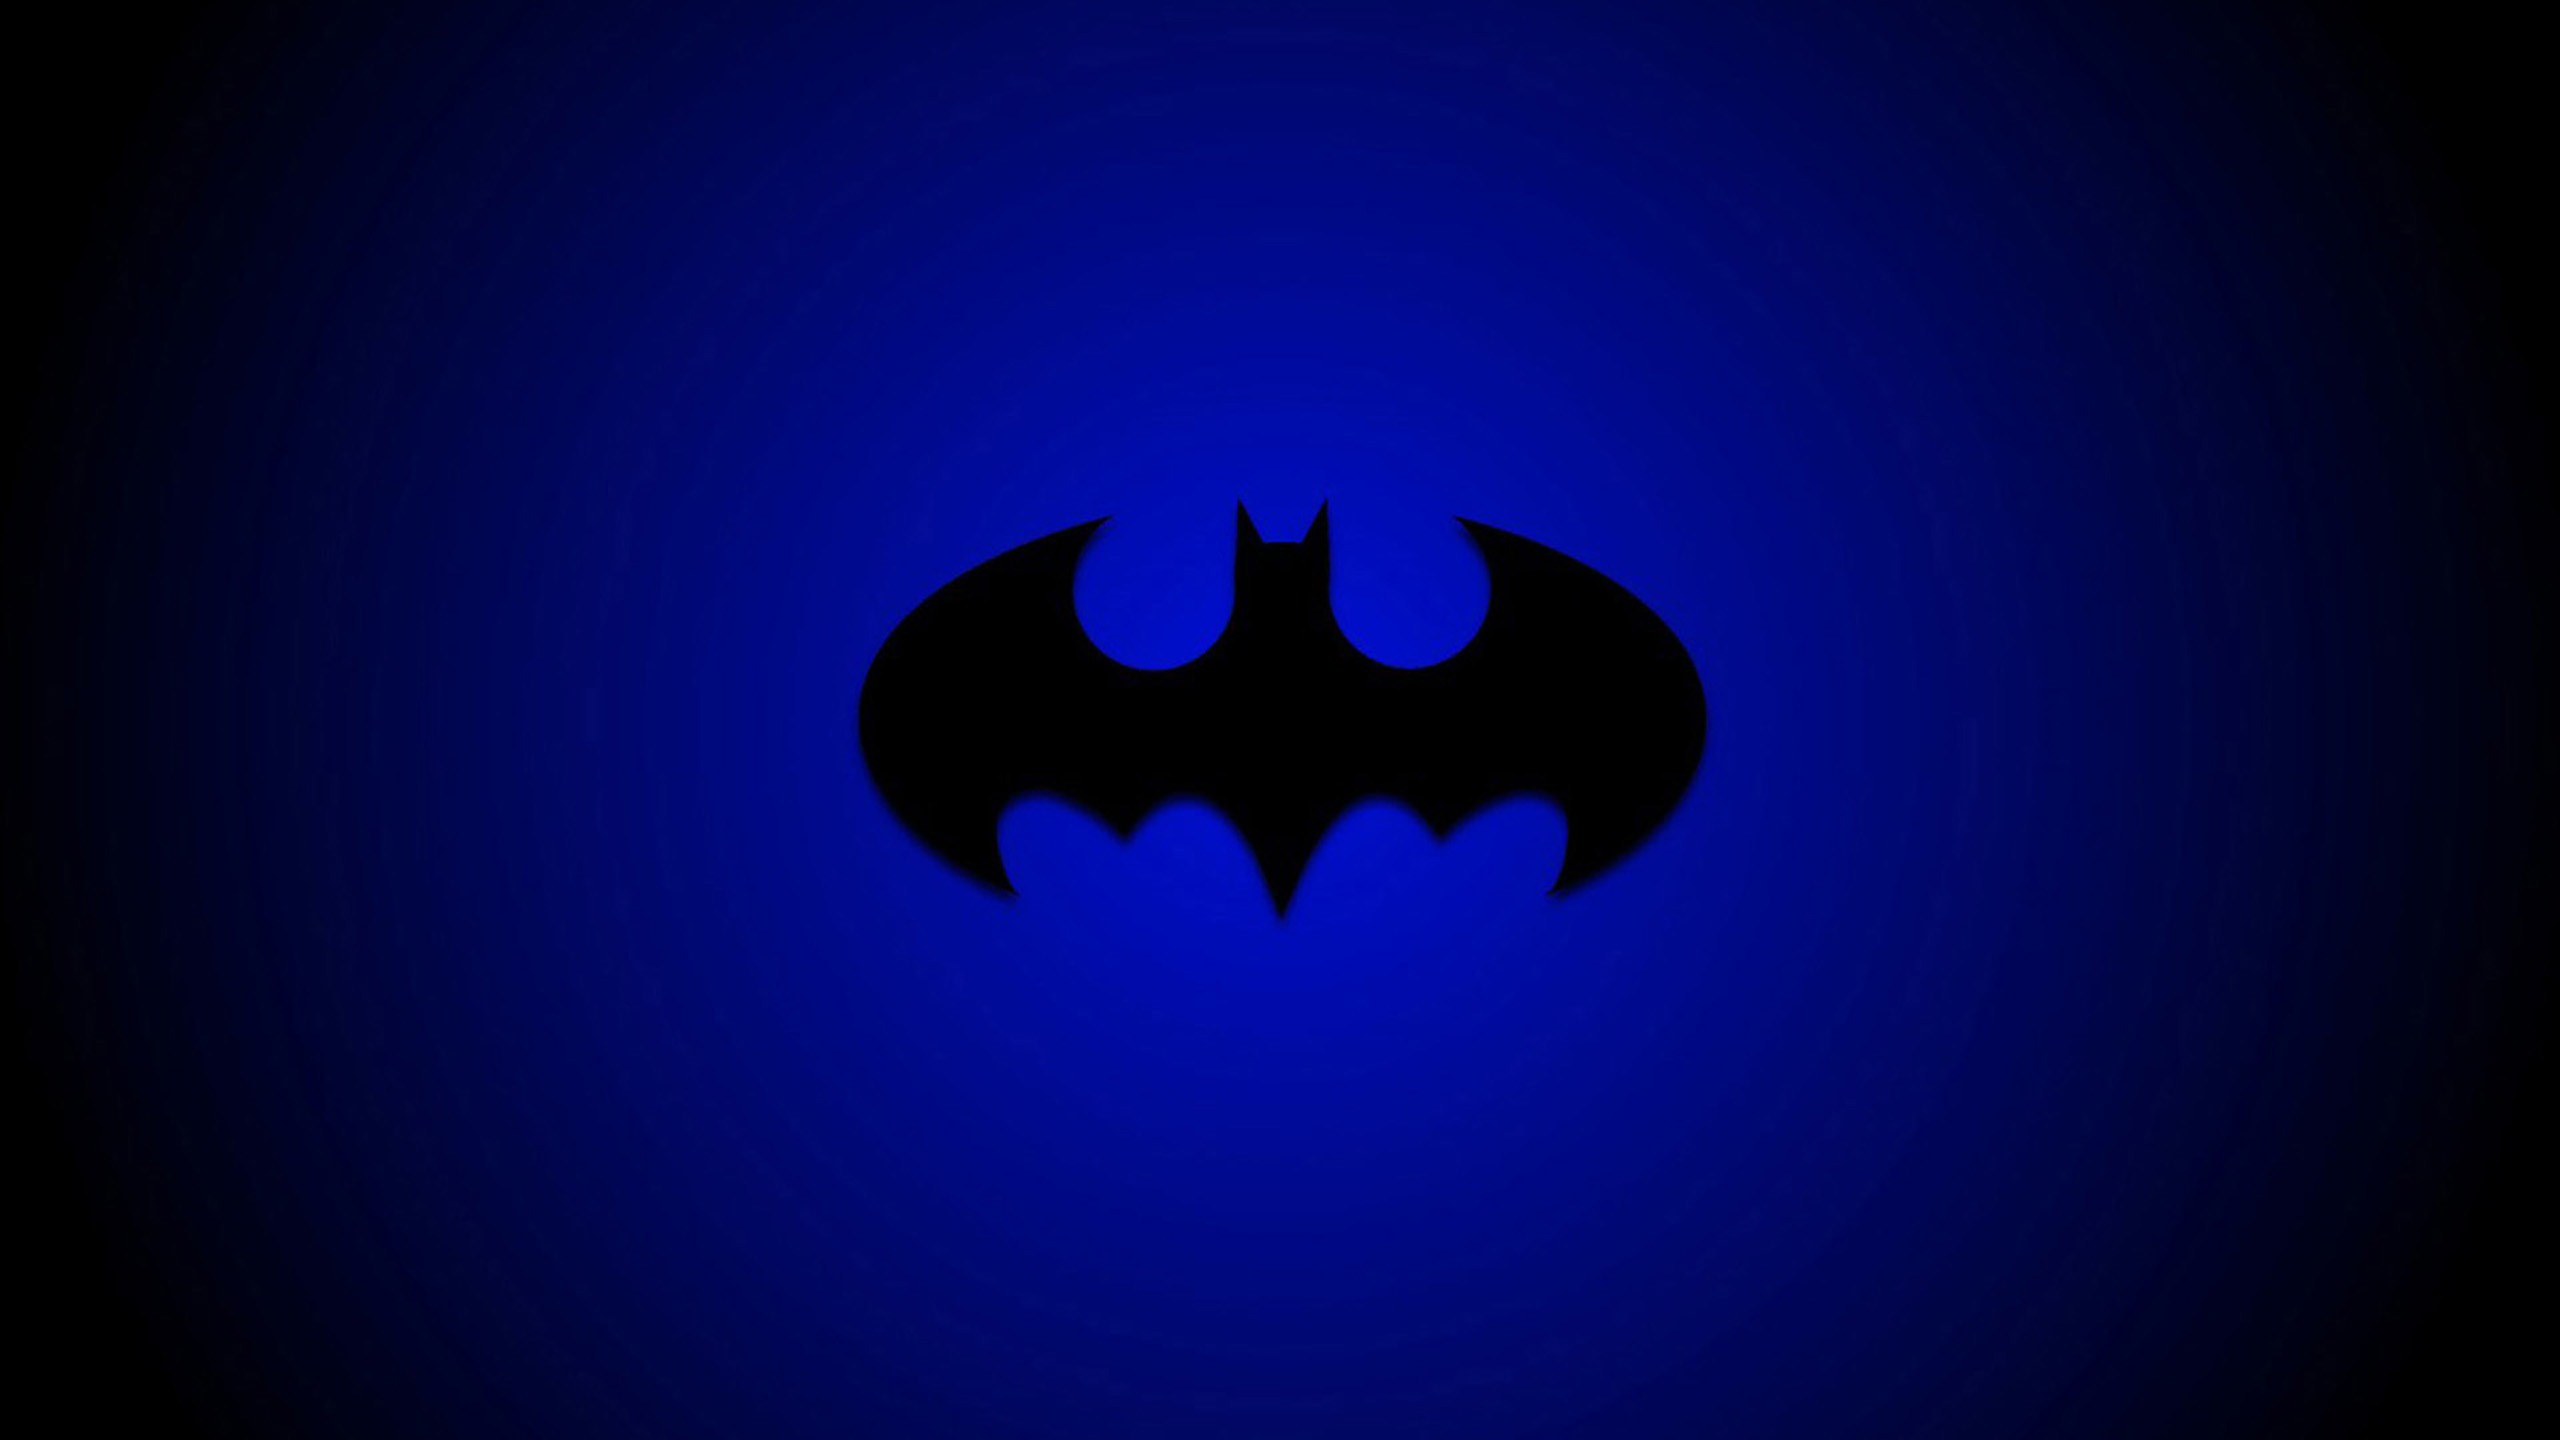 Batman Logo HD Wallpapers 2560x1440